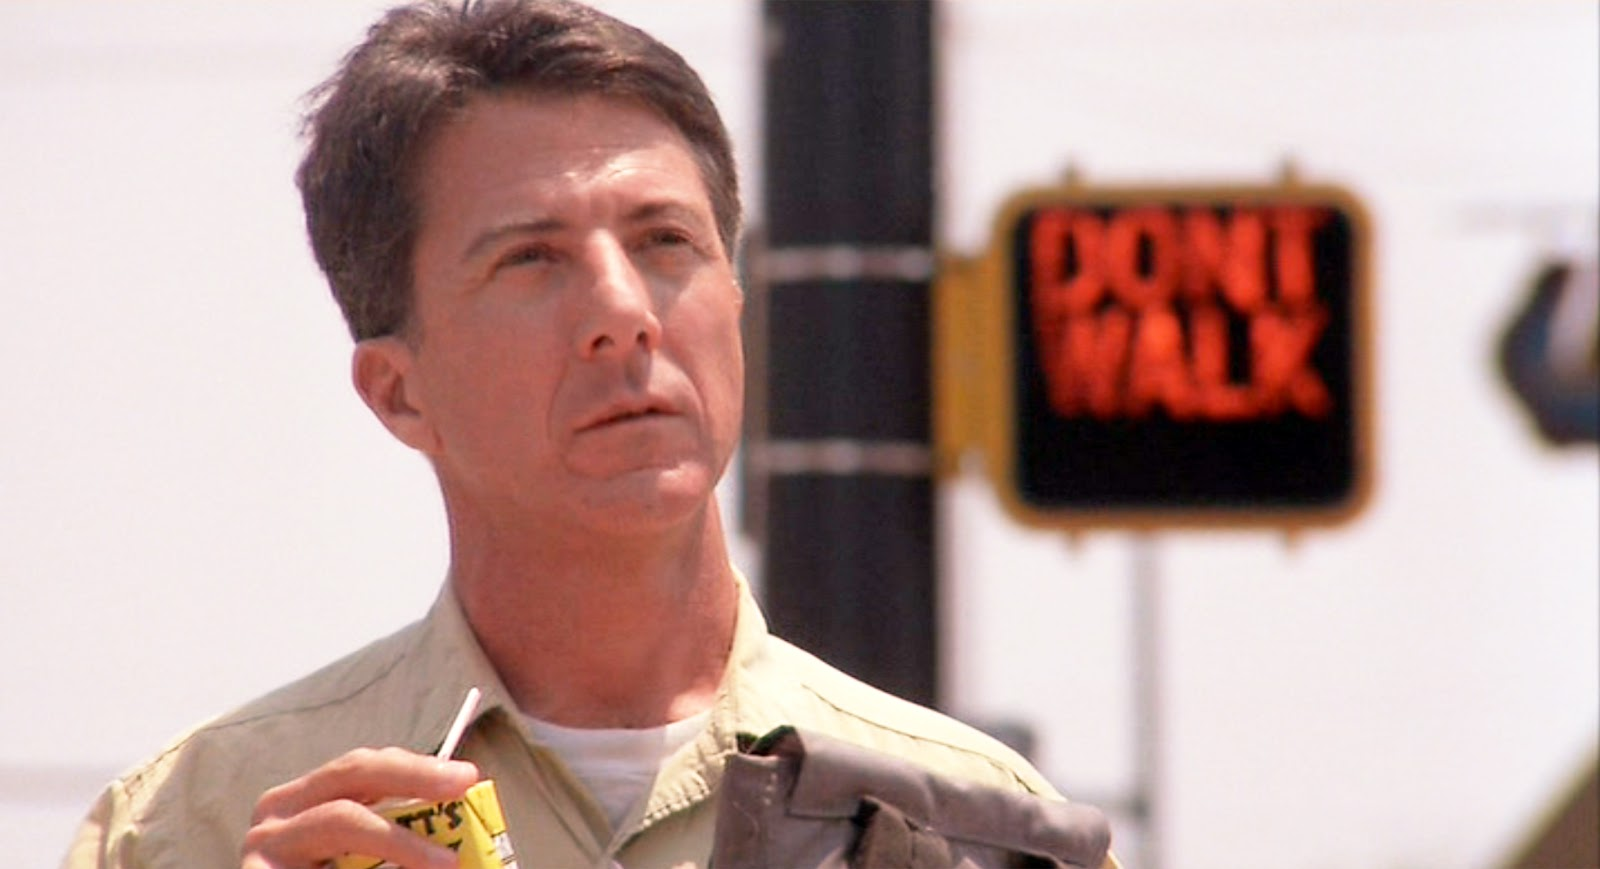 Dustin Hoffman in Rain Man, 1988